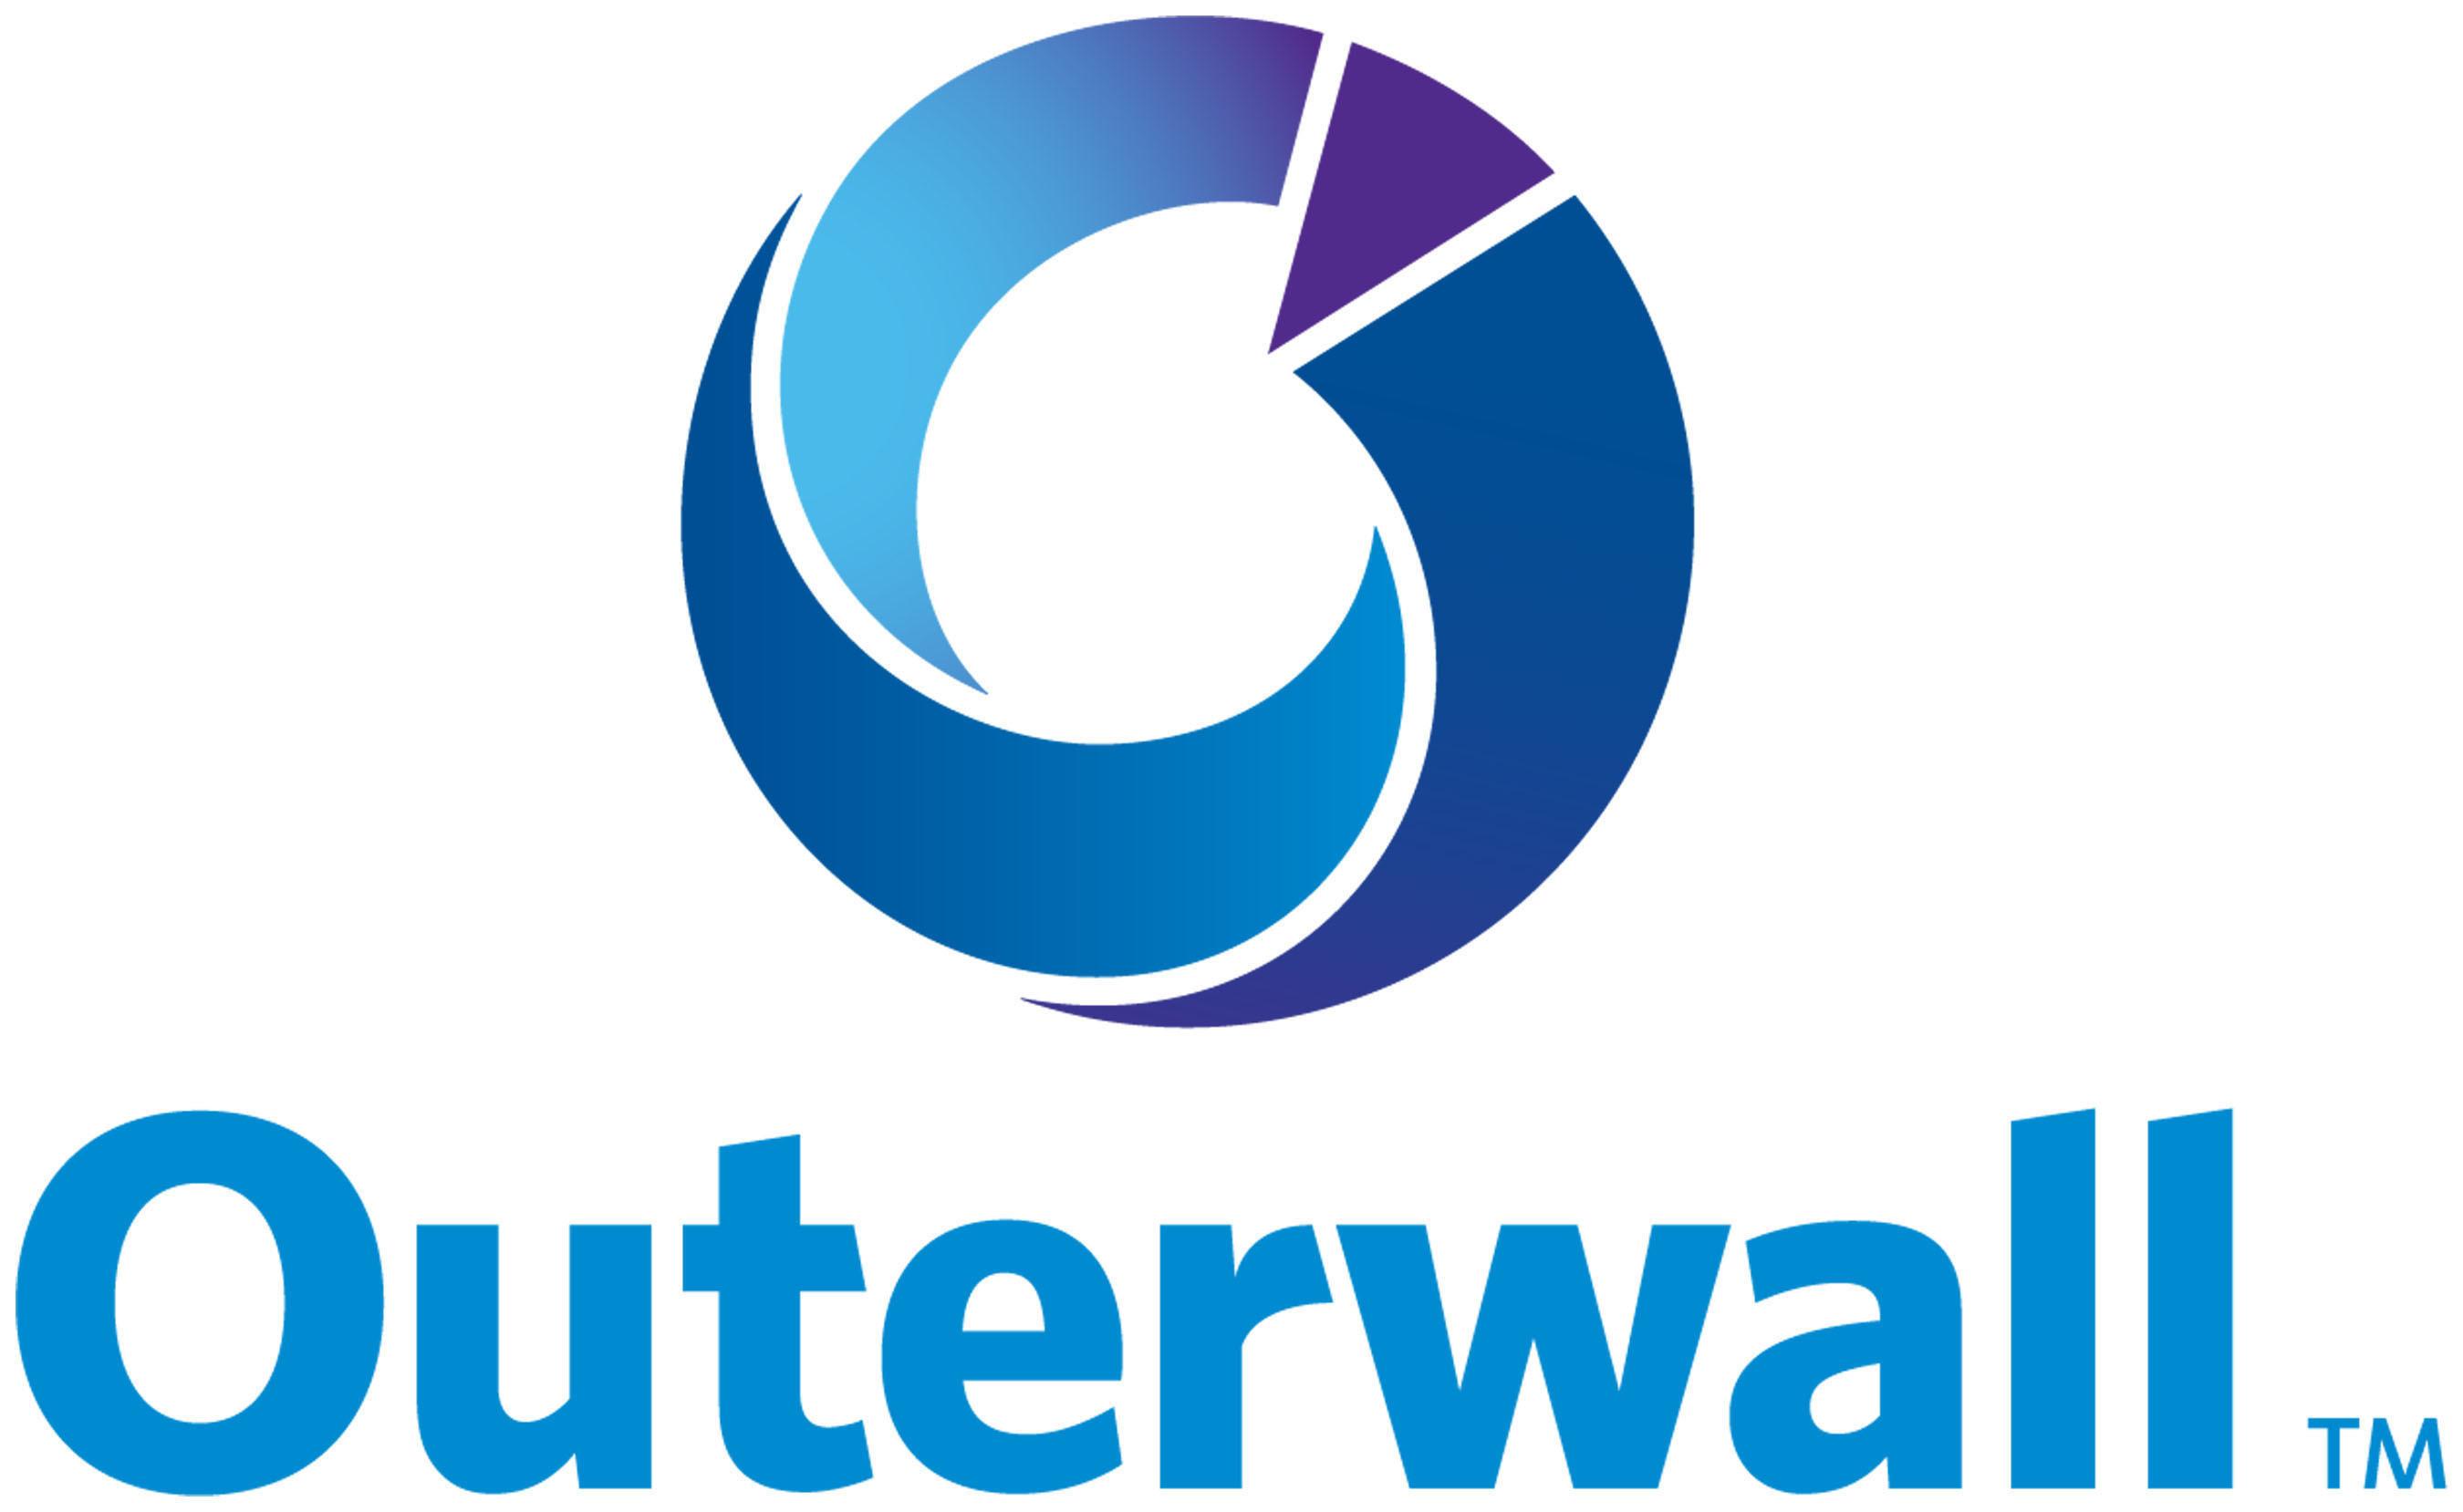 Outerwall Inc. logo.